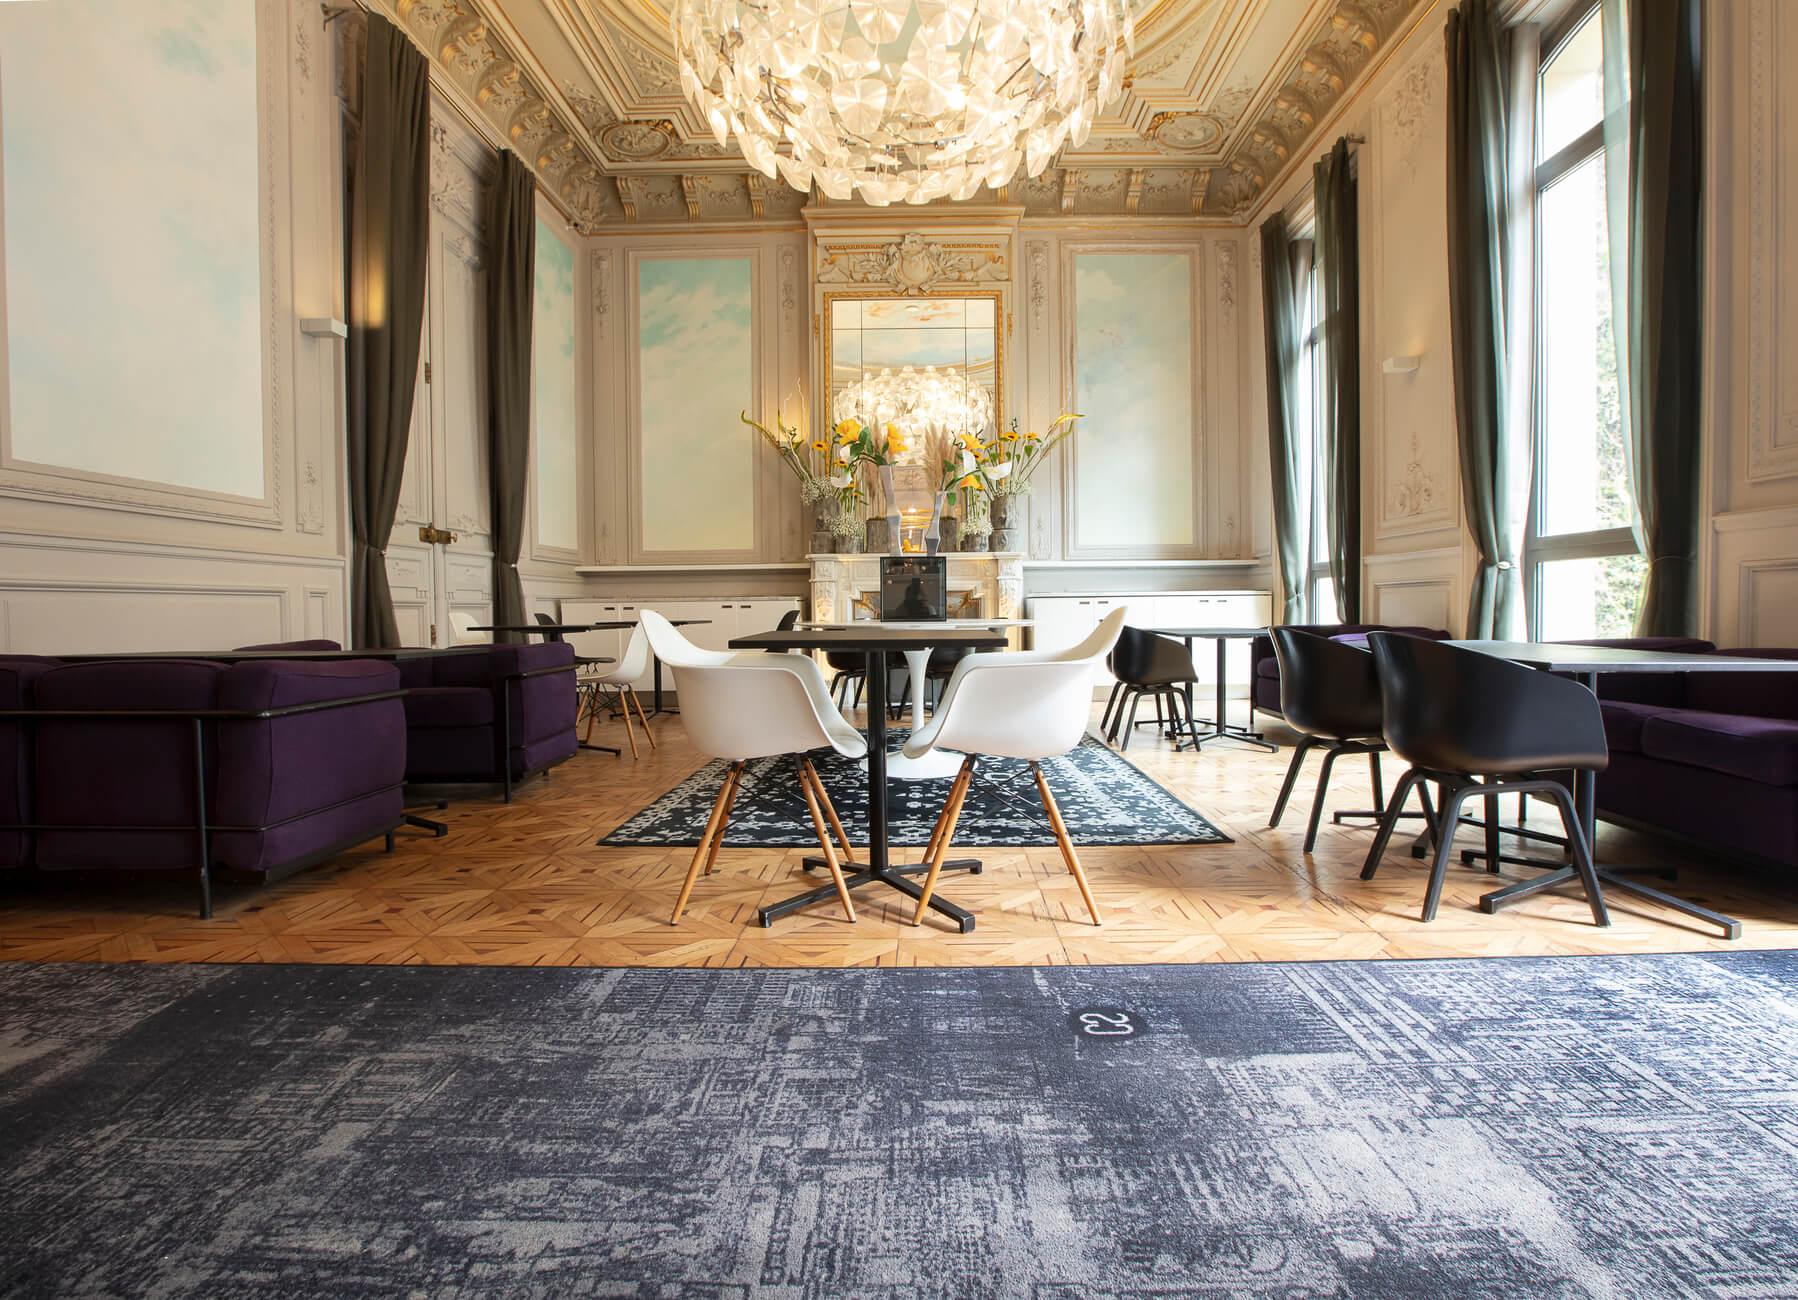 HIGHLINE-Hotel C2 Marseille-France-2